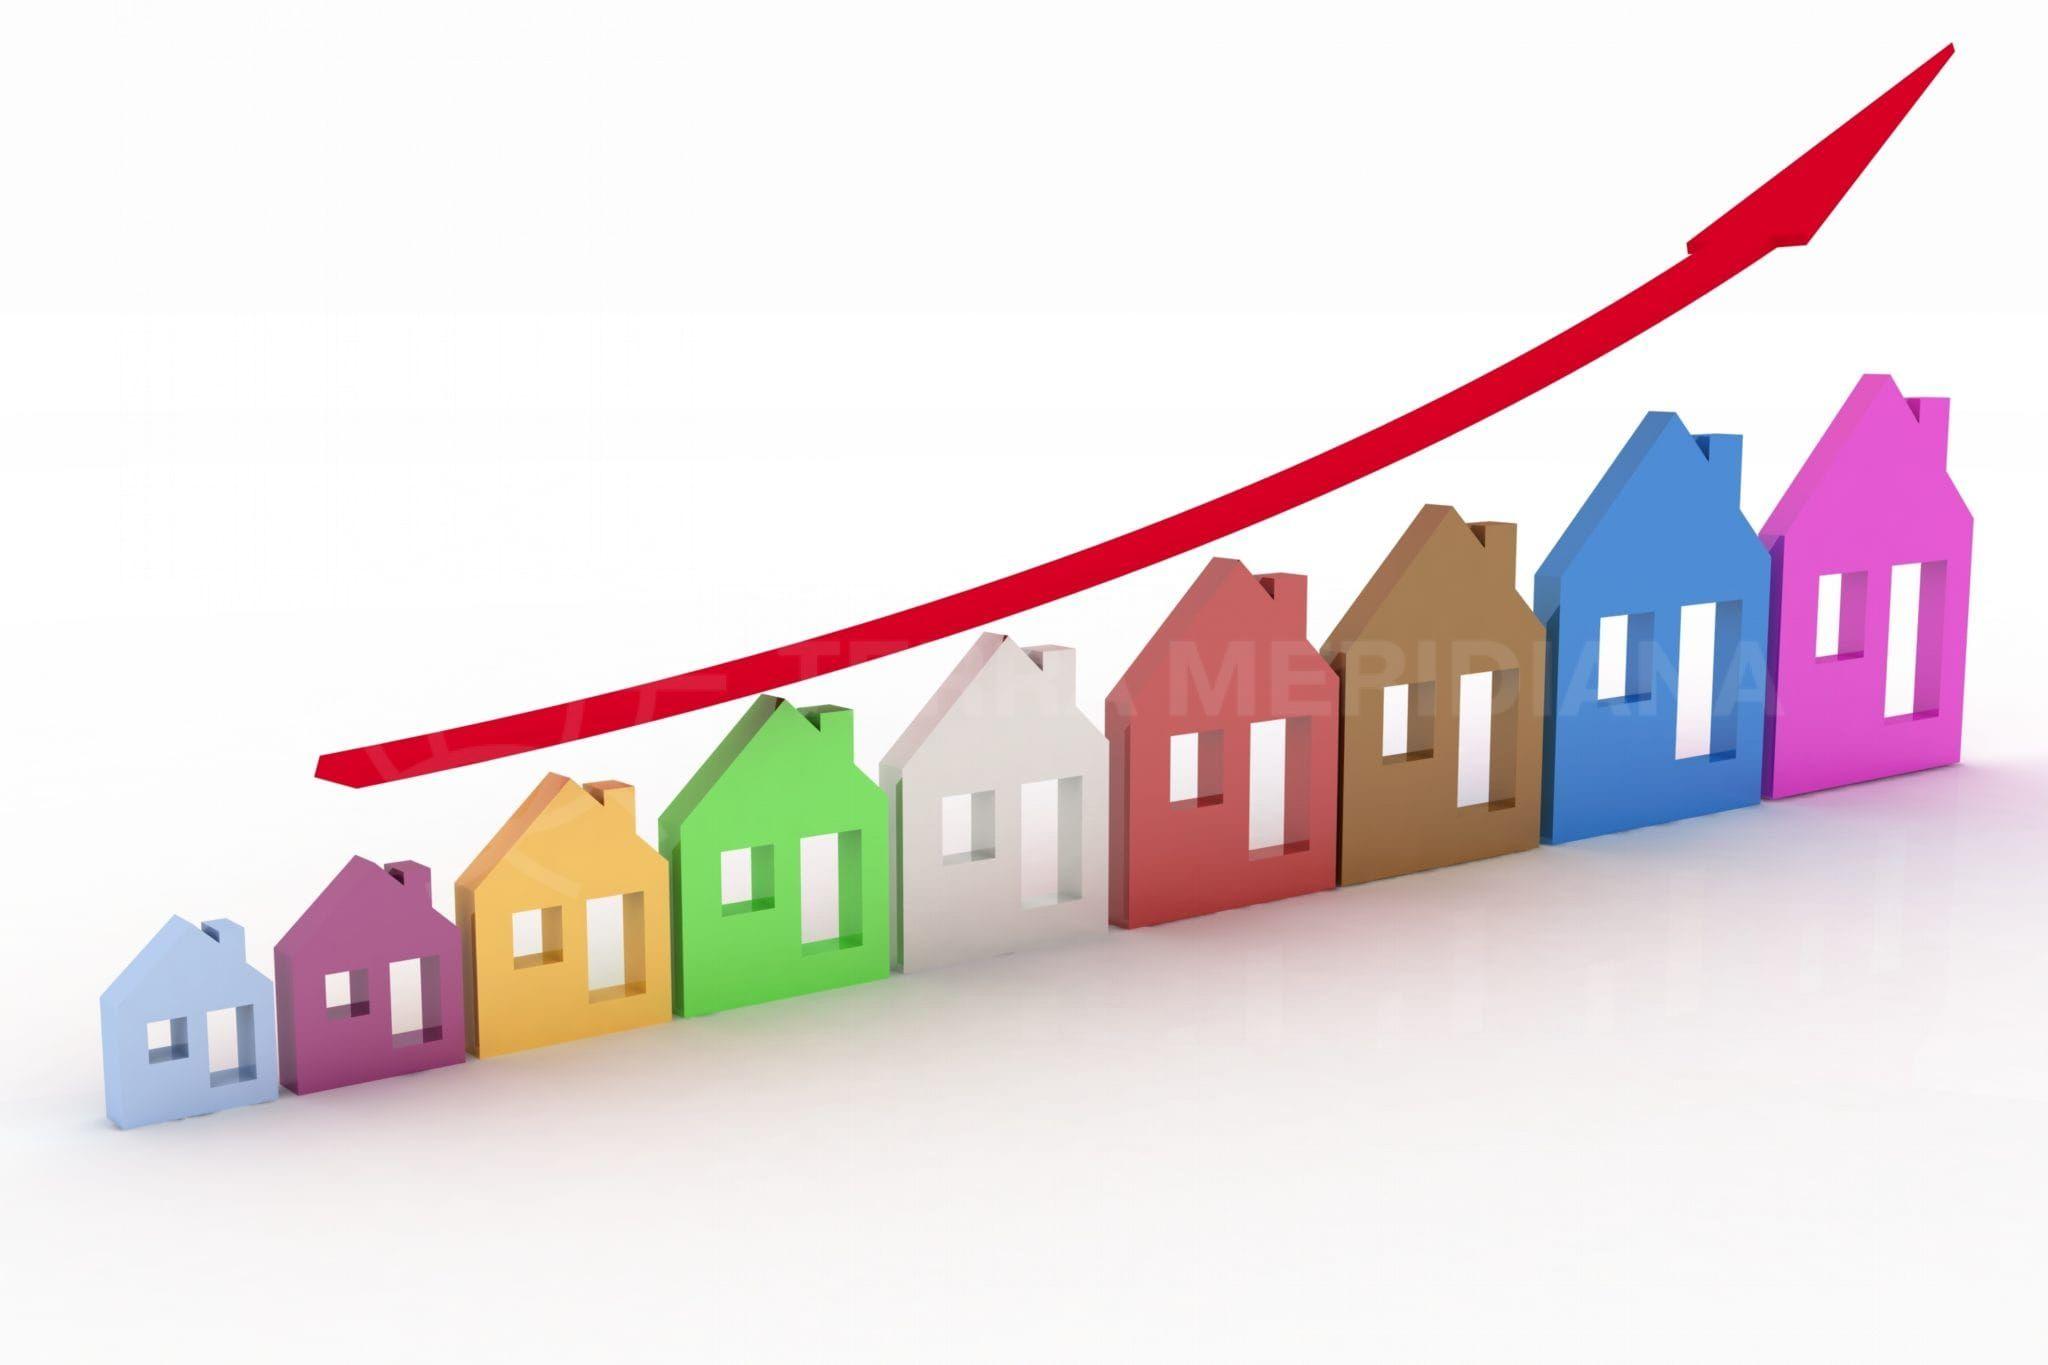 Spain's property market grew by 13.6% in 2016